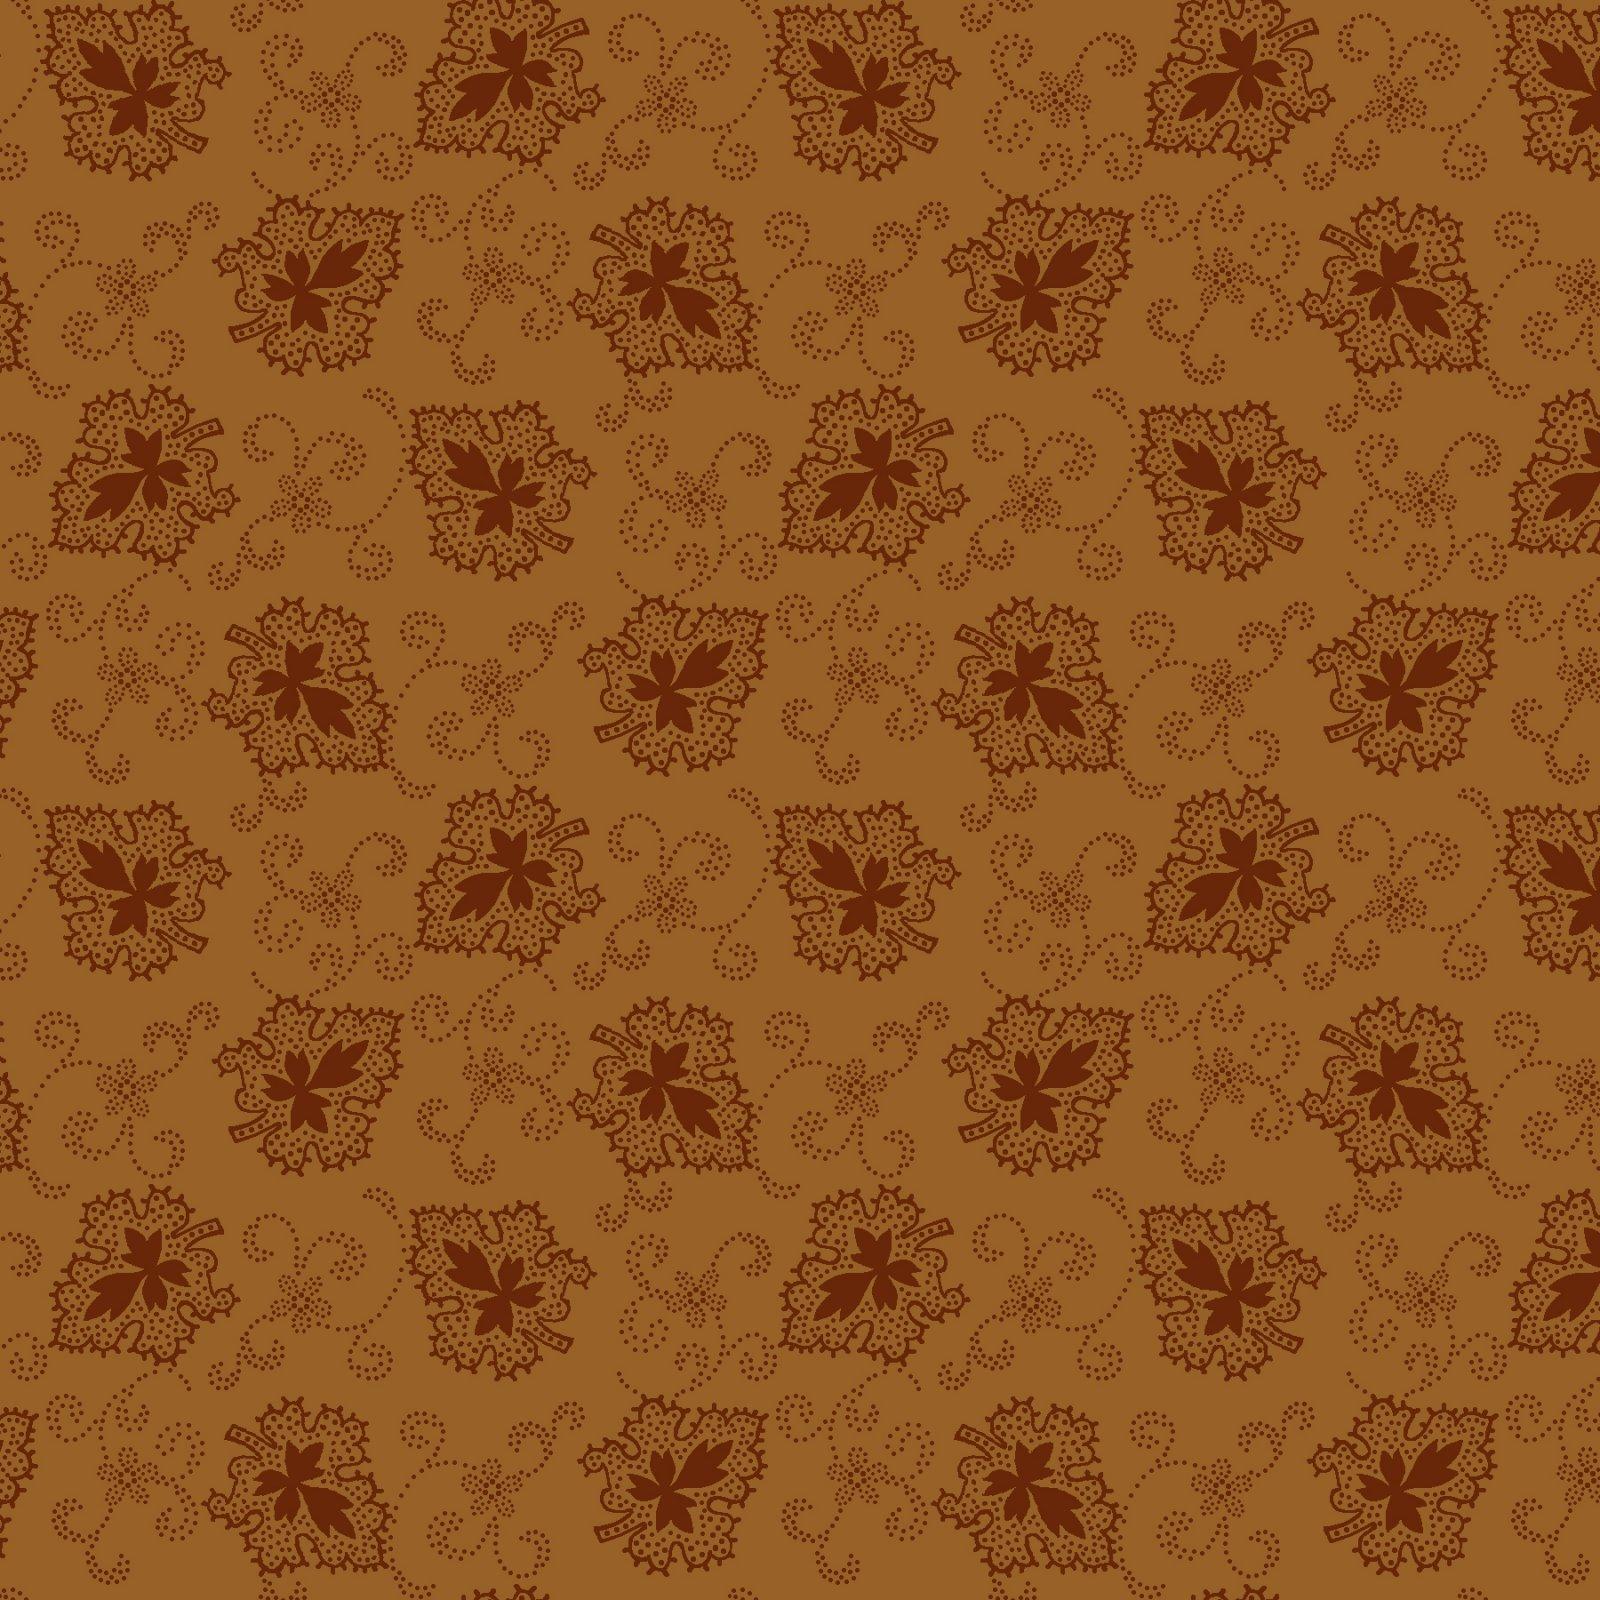 Buttermilk Autumn - 2275-44 * 1/2 yard